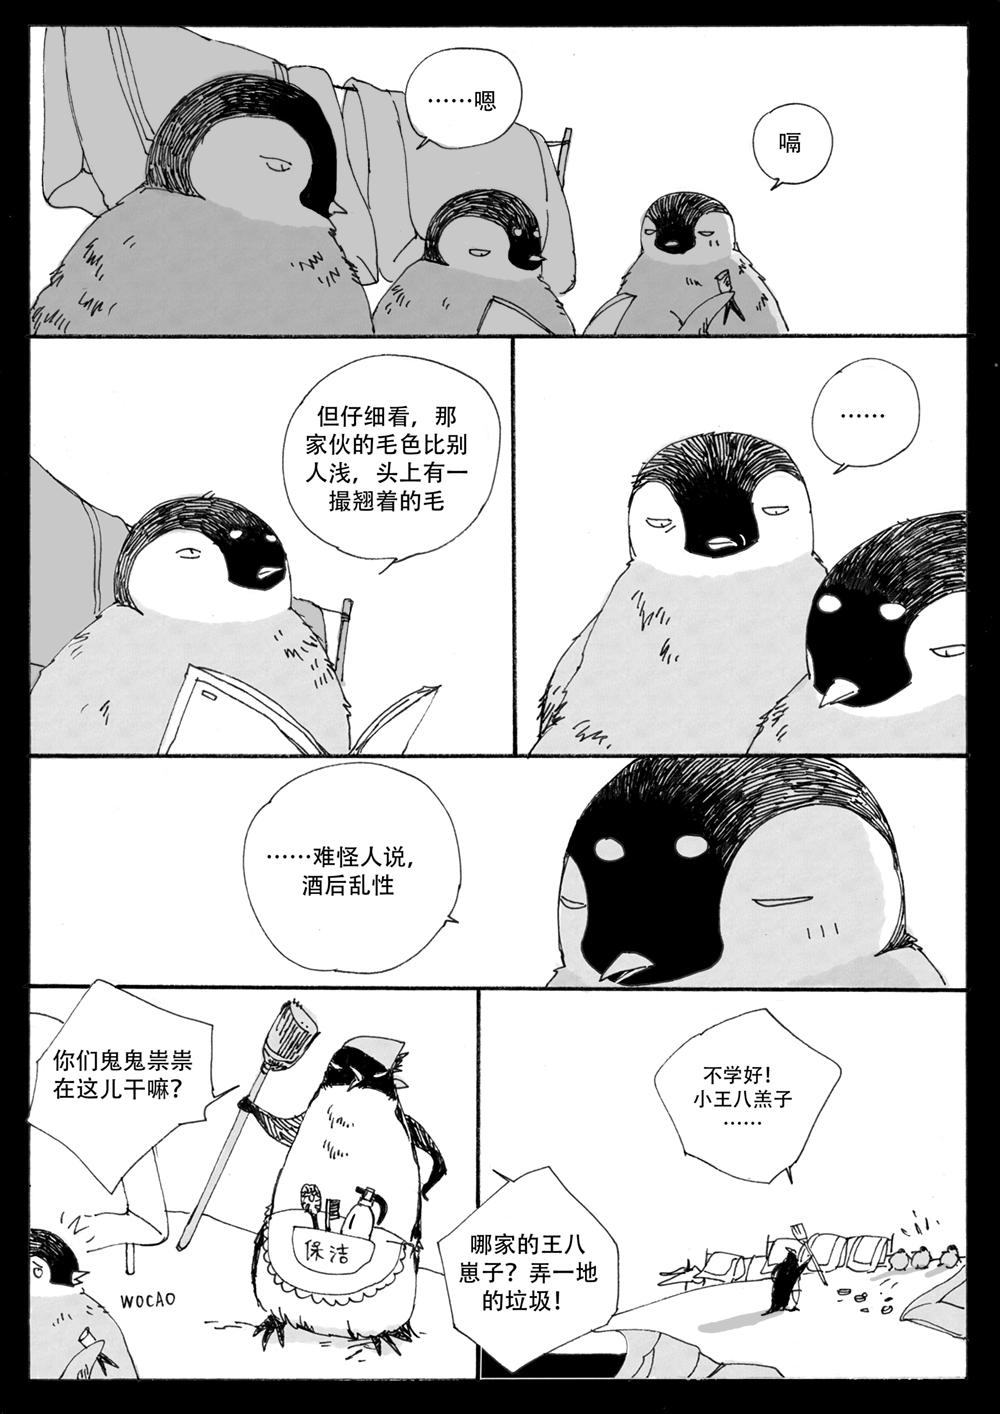 penguin21_1000